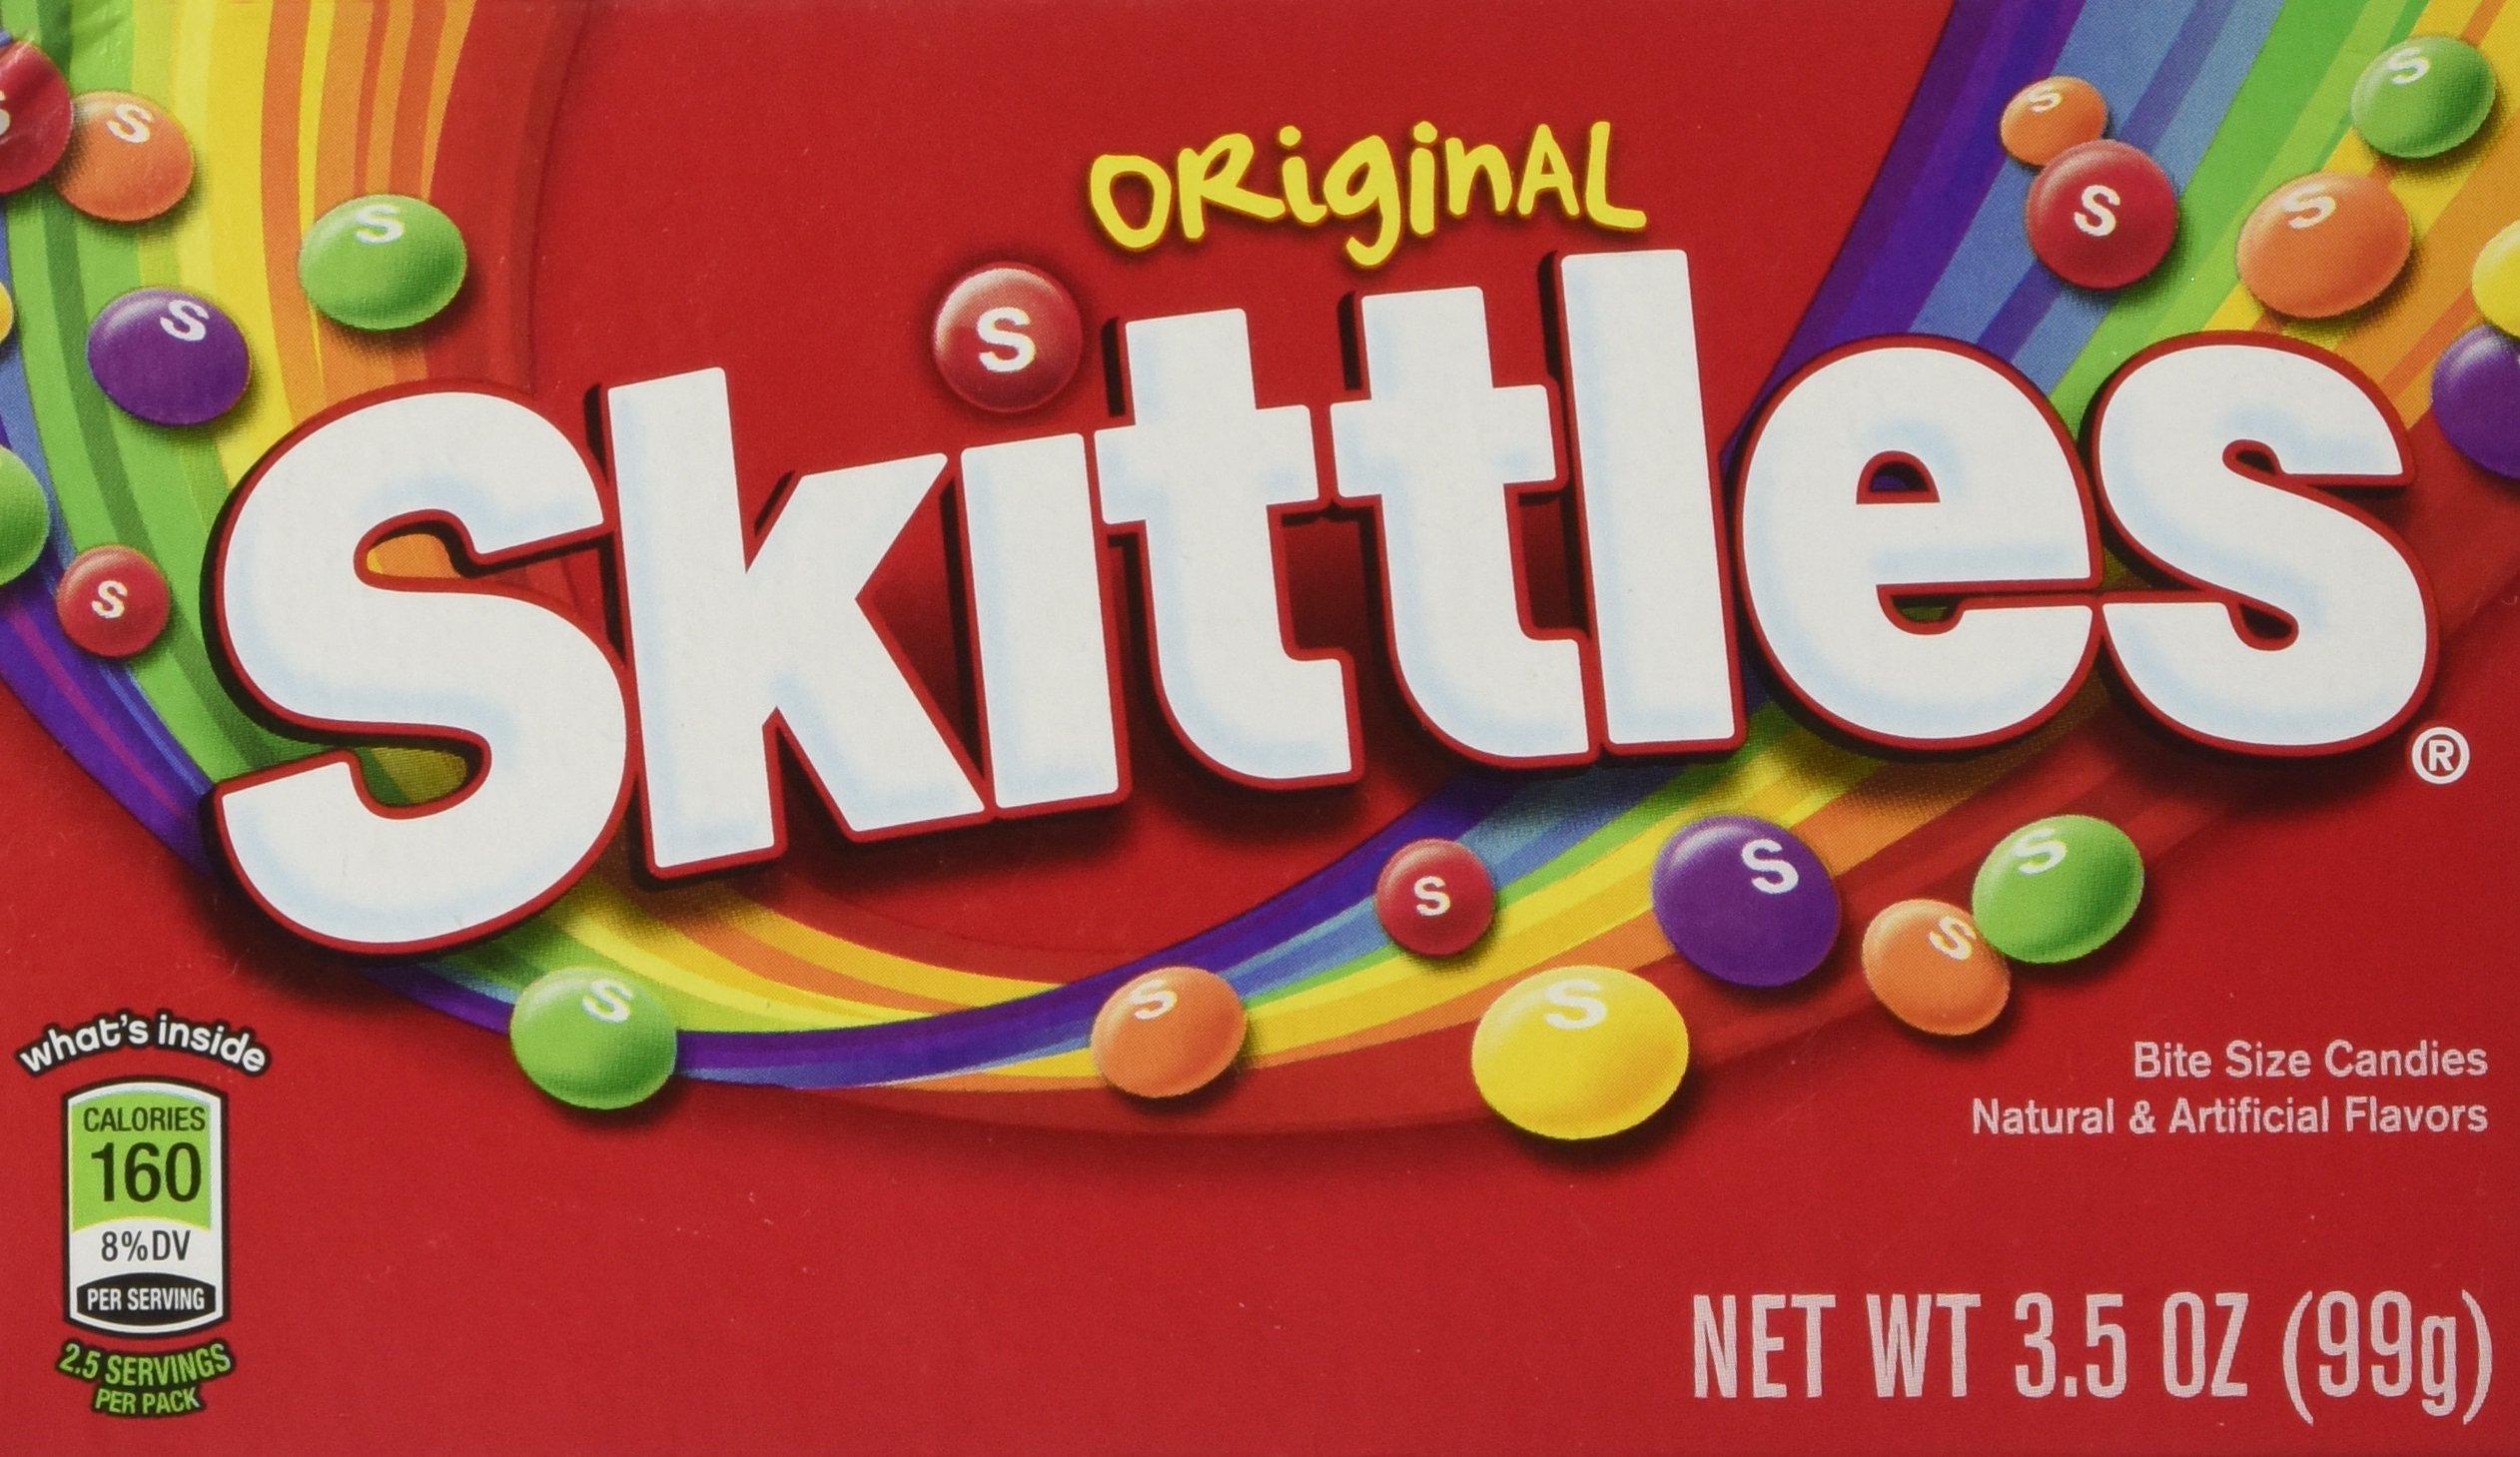 Skittles Original Bite Size Candies: 12 Packs of 3.5 Oz